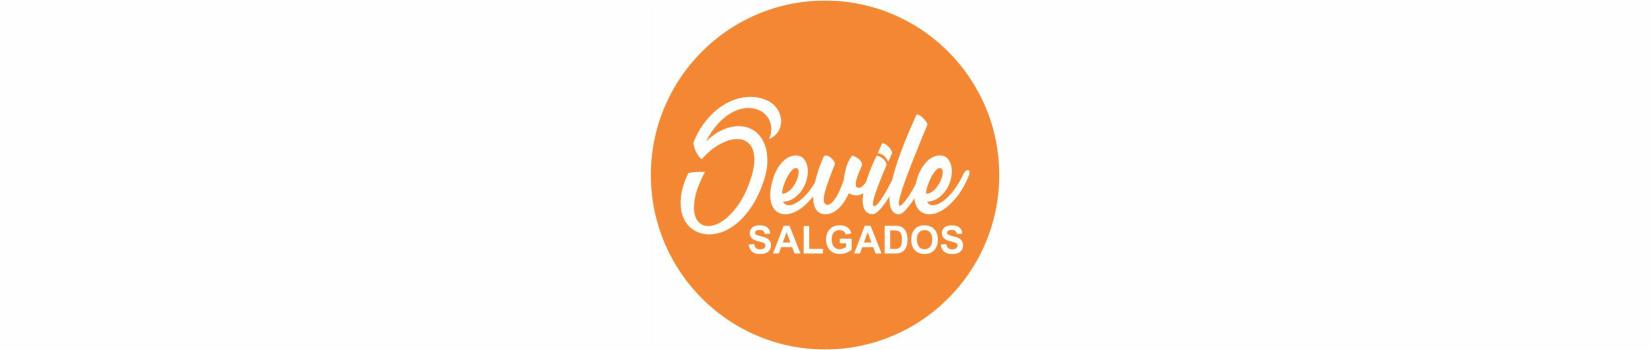 Sevile Salgados